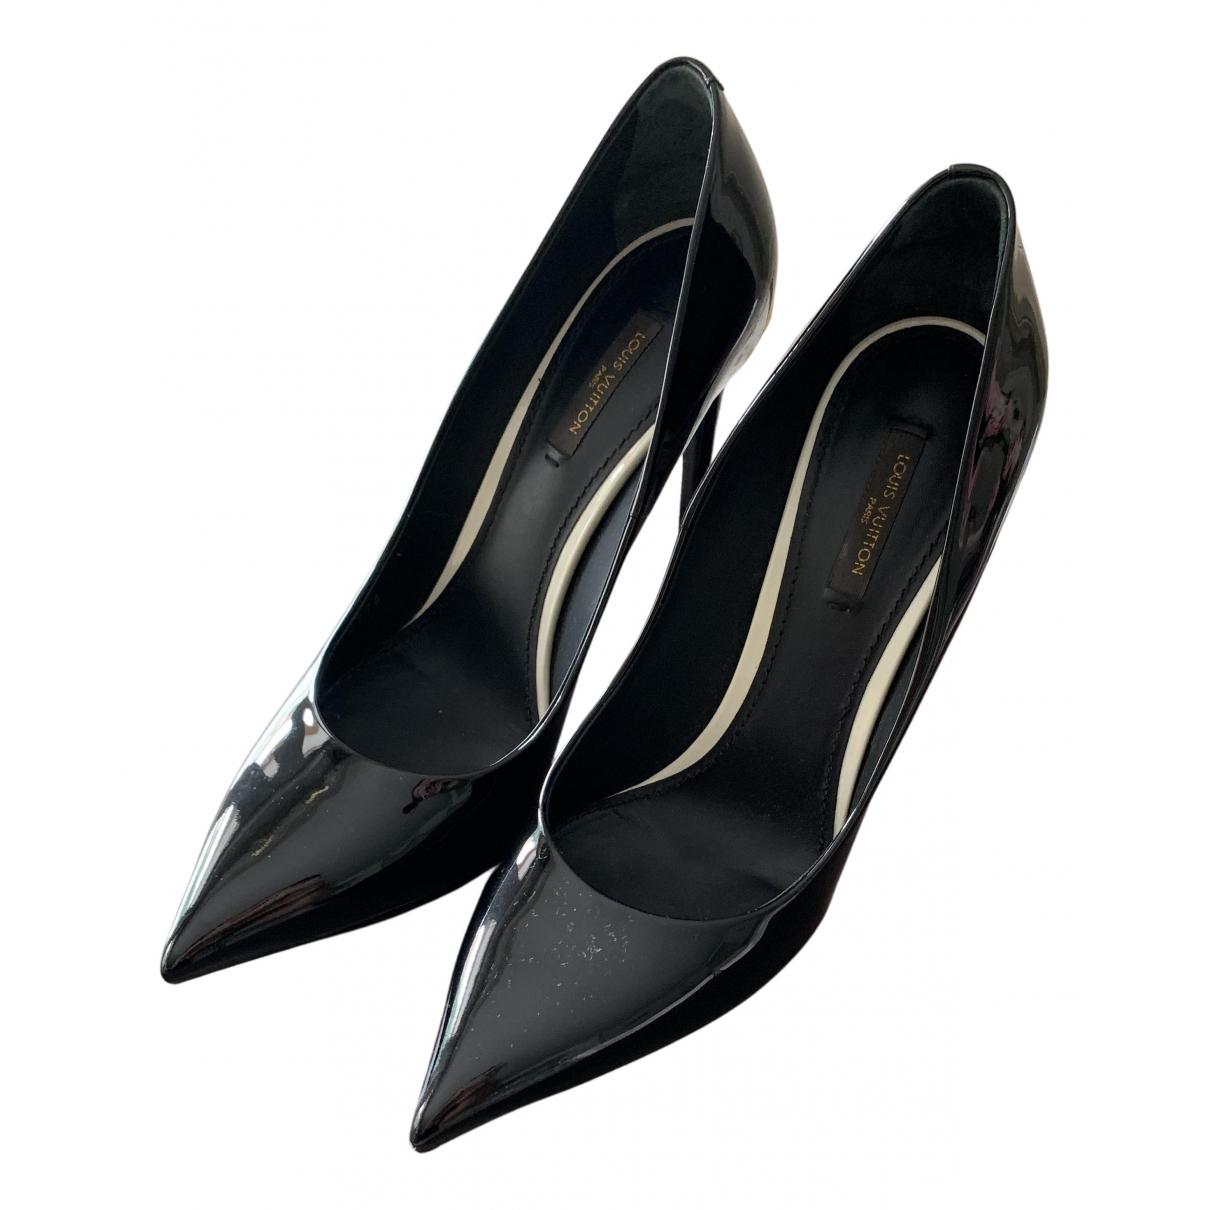 Louis Vuitton N Black Patent leather Heels for Women 39.5 EU